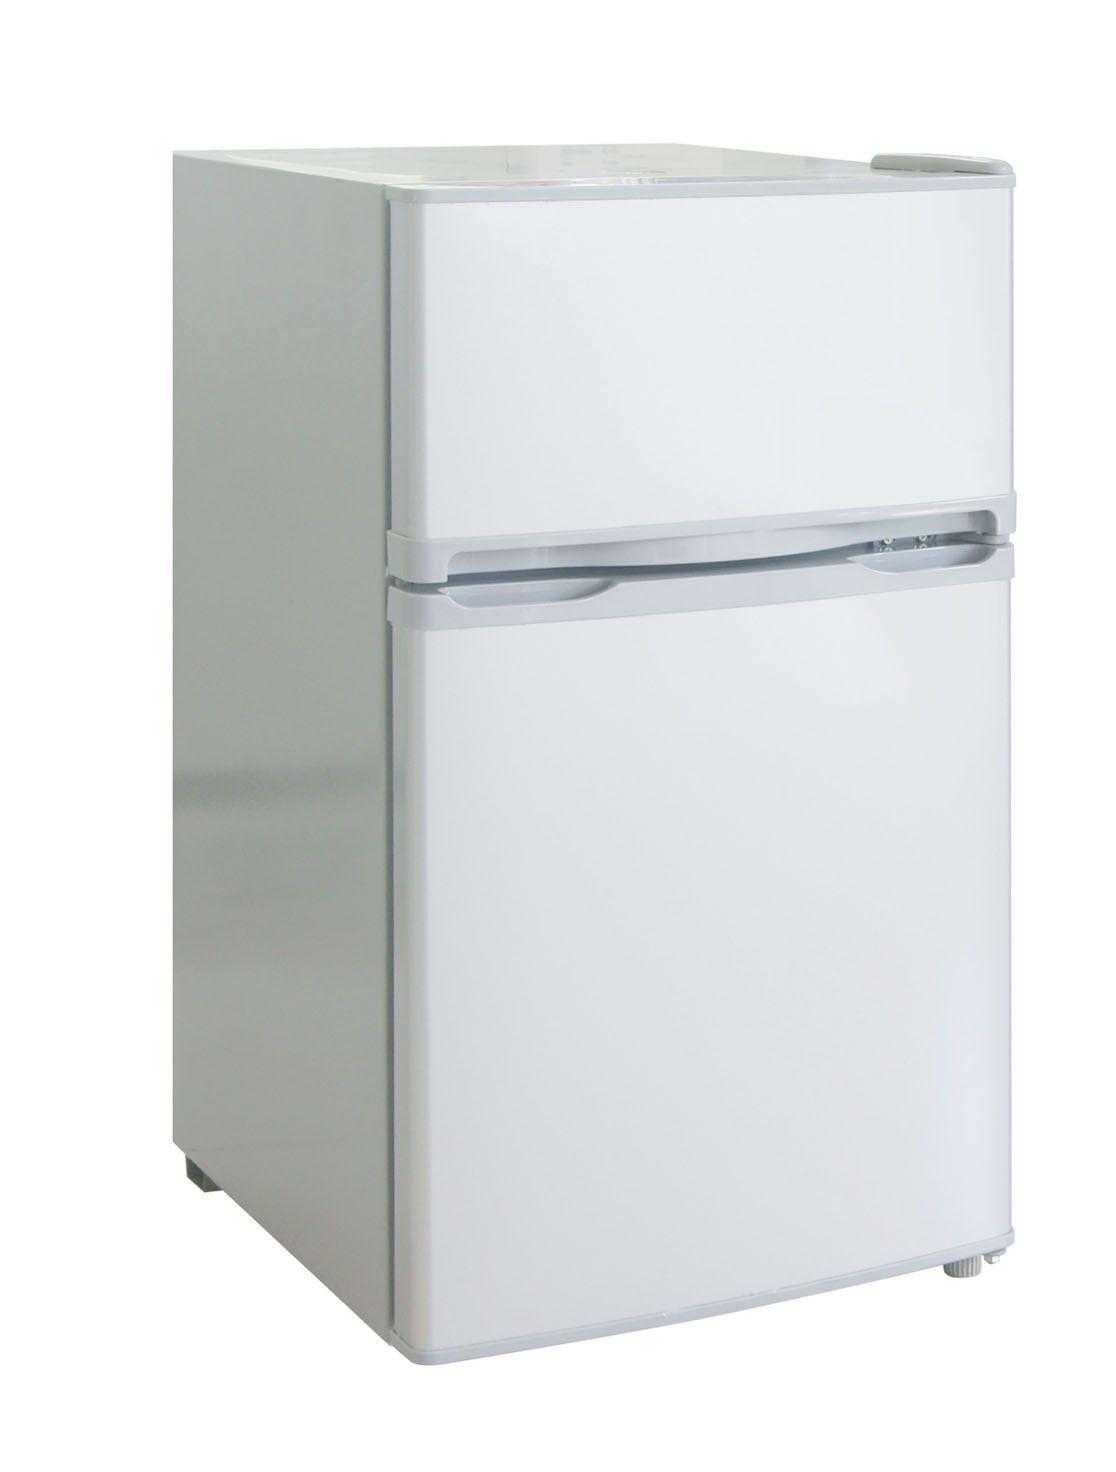 RCA-Igloo 3.2 Cubic Foot 2 Door Fridge and Freezer, White ...